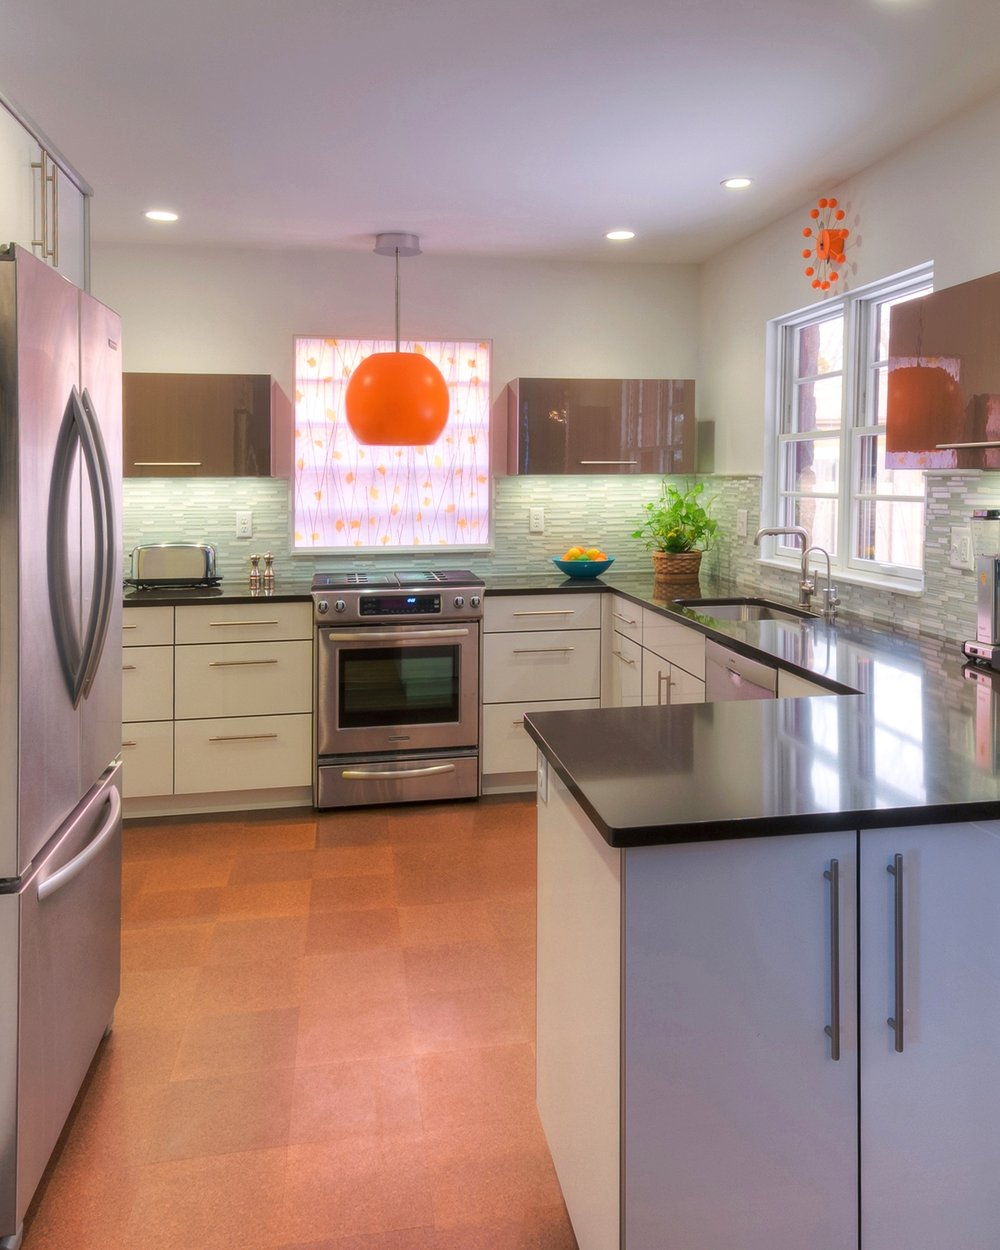 Kitchens_55.jpg